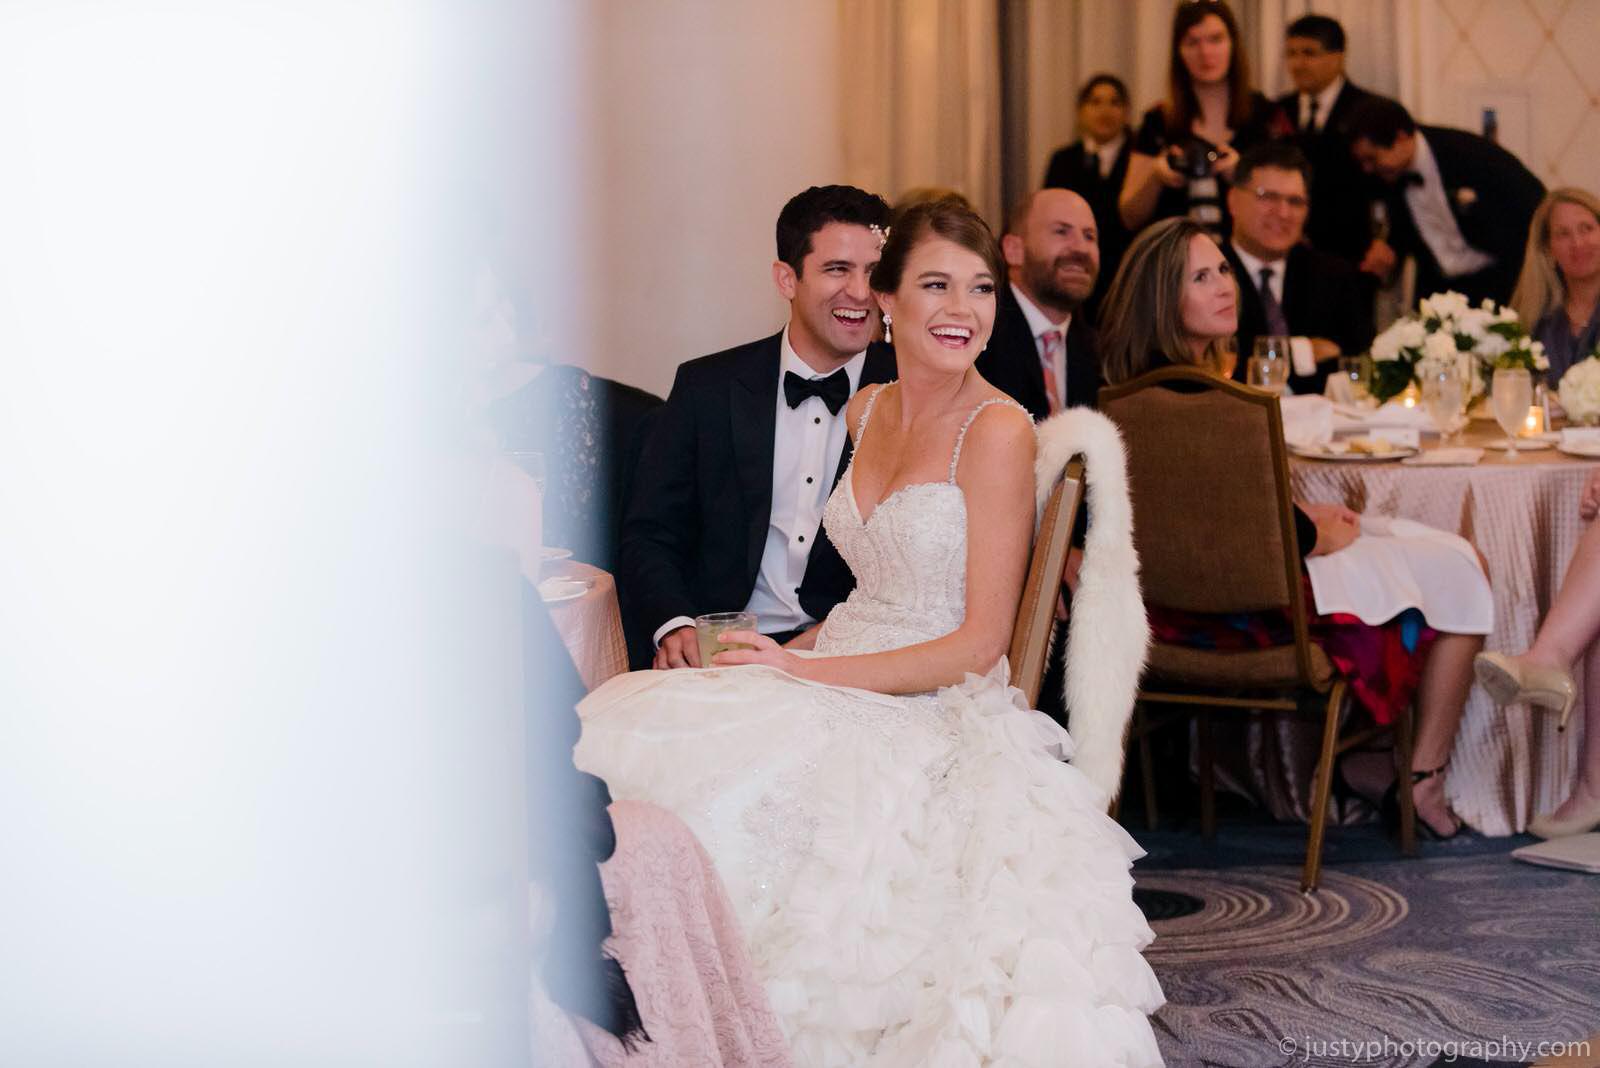 Omni Shoreham wedding photos-washington-dc-wedding-venues (157 of 171).jpg